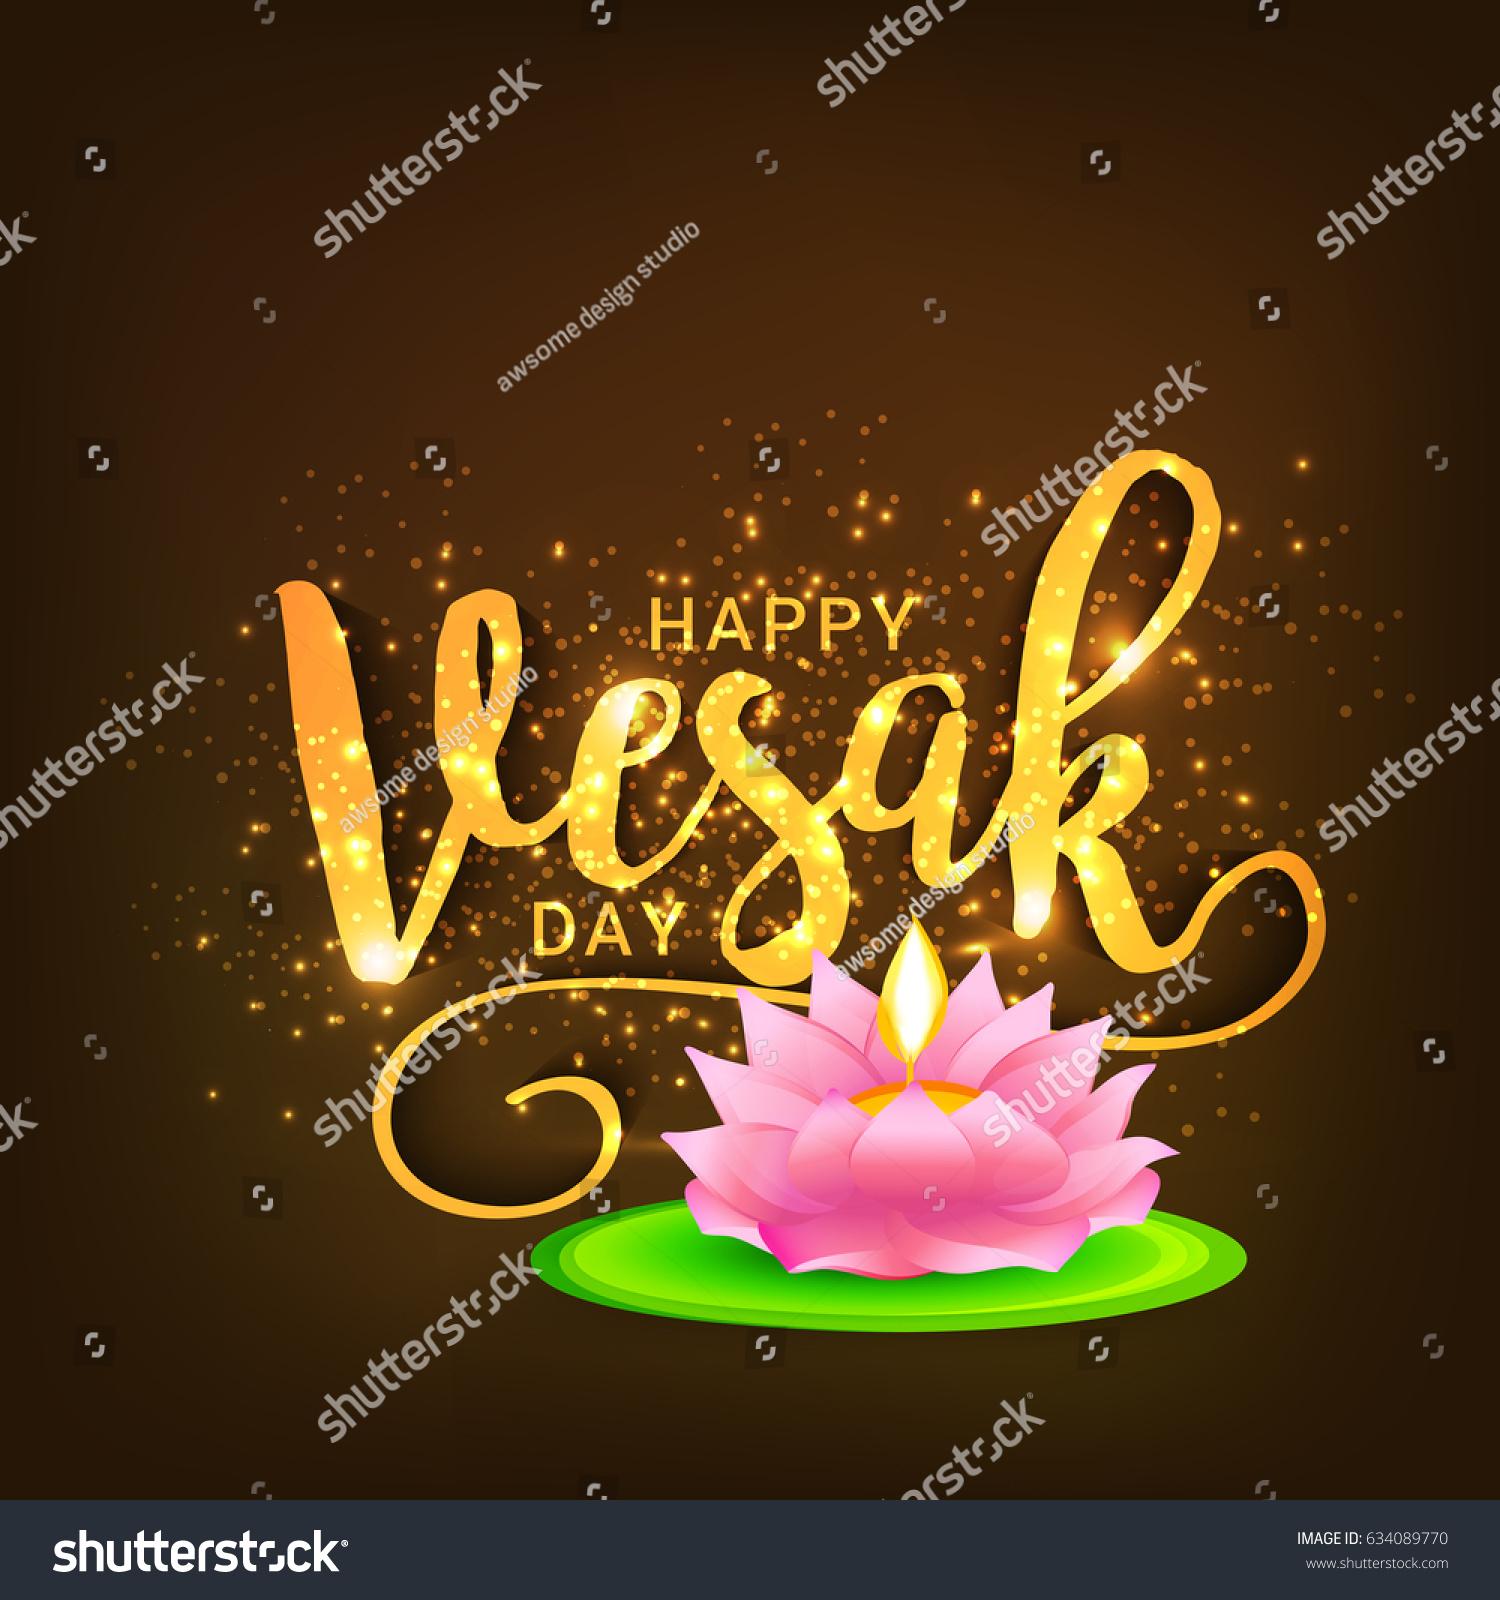 Illustration Happy Vesak Day Buddha Purnima Stock Vector Royalty